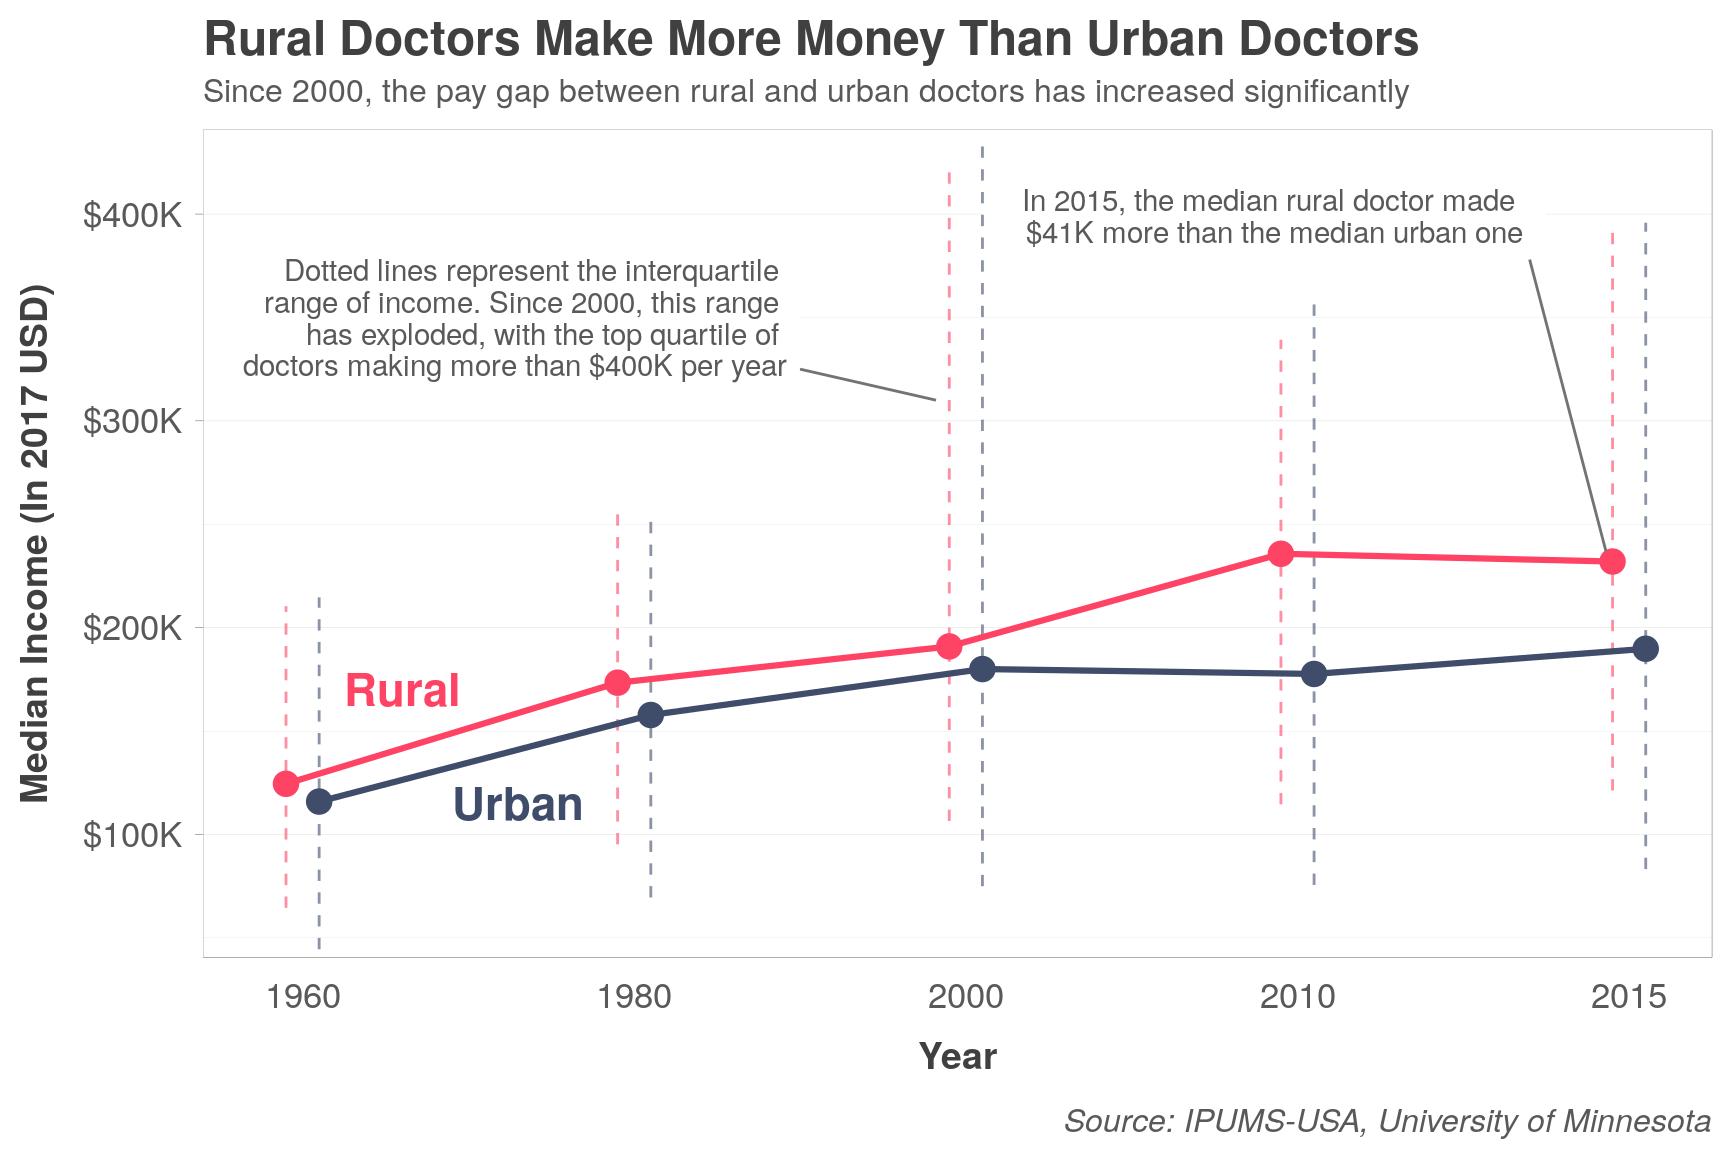 Rural doctors make more money than urban doctors